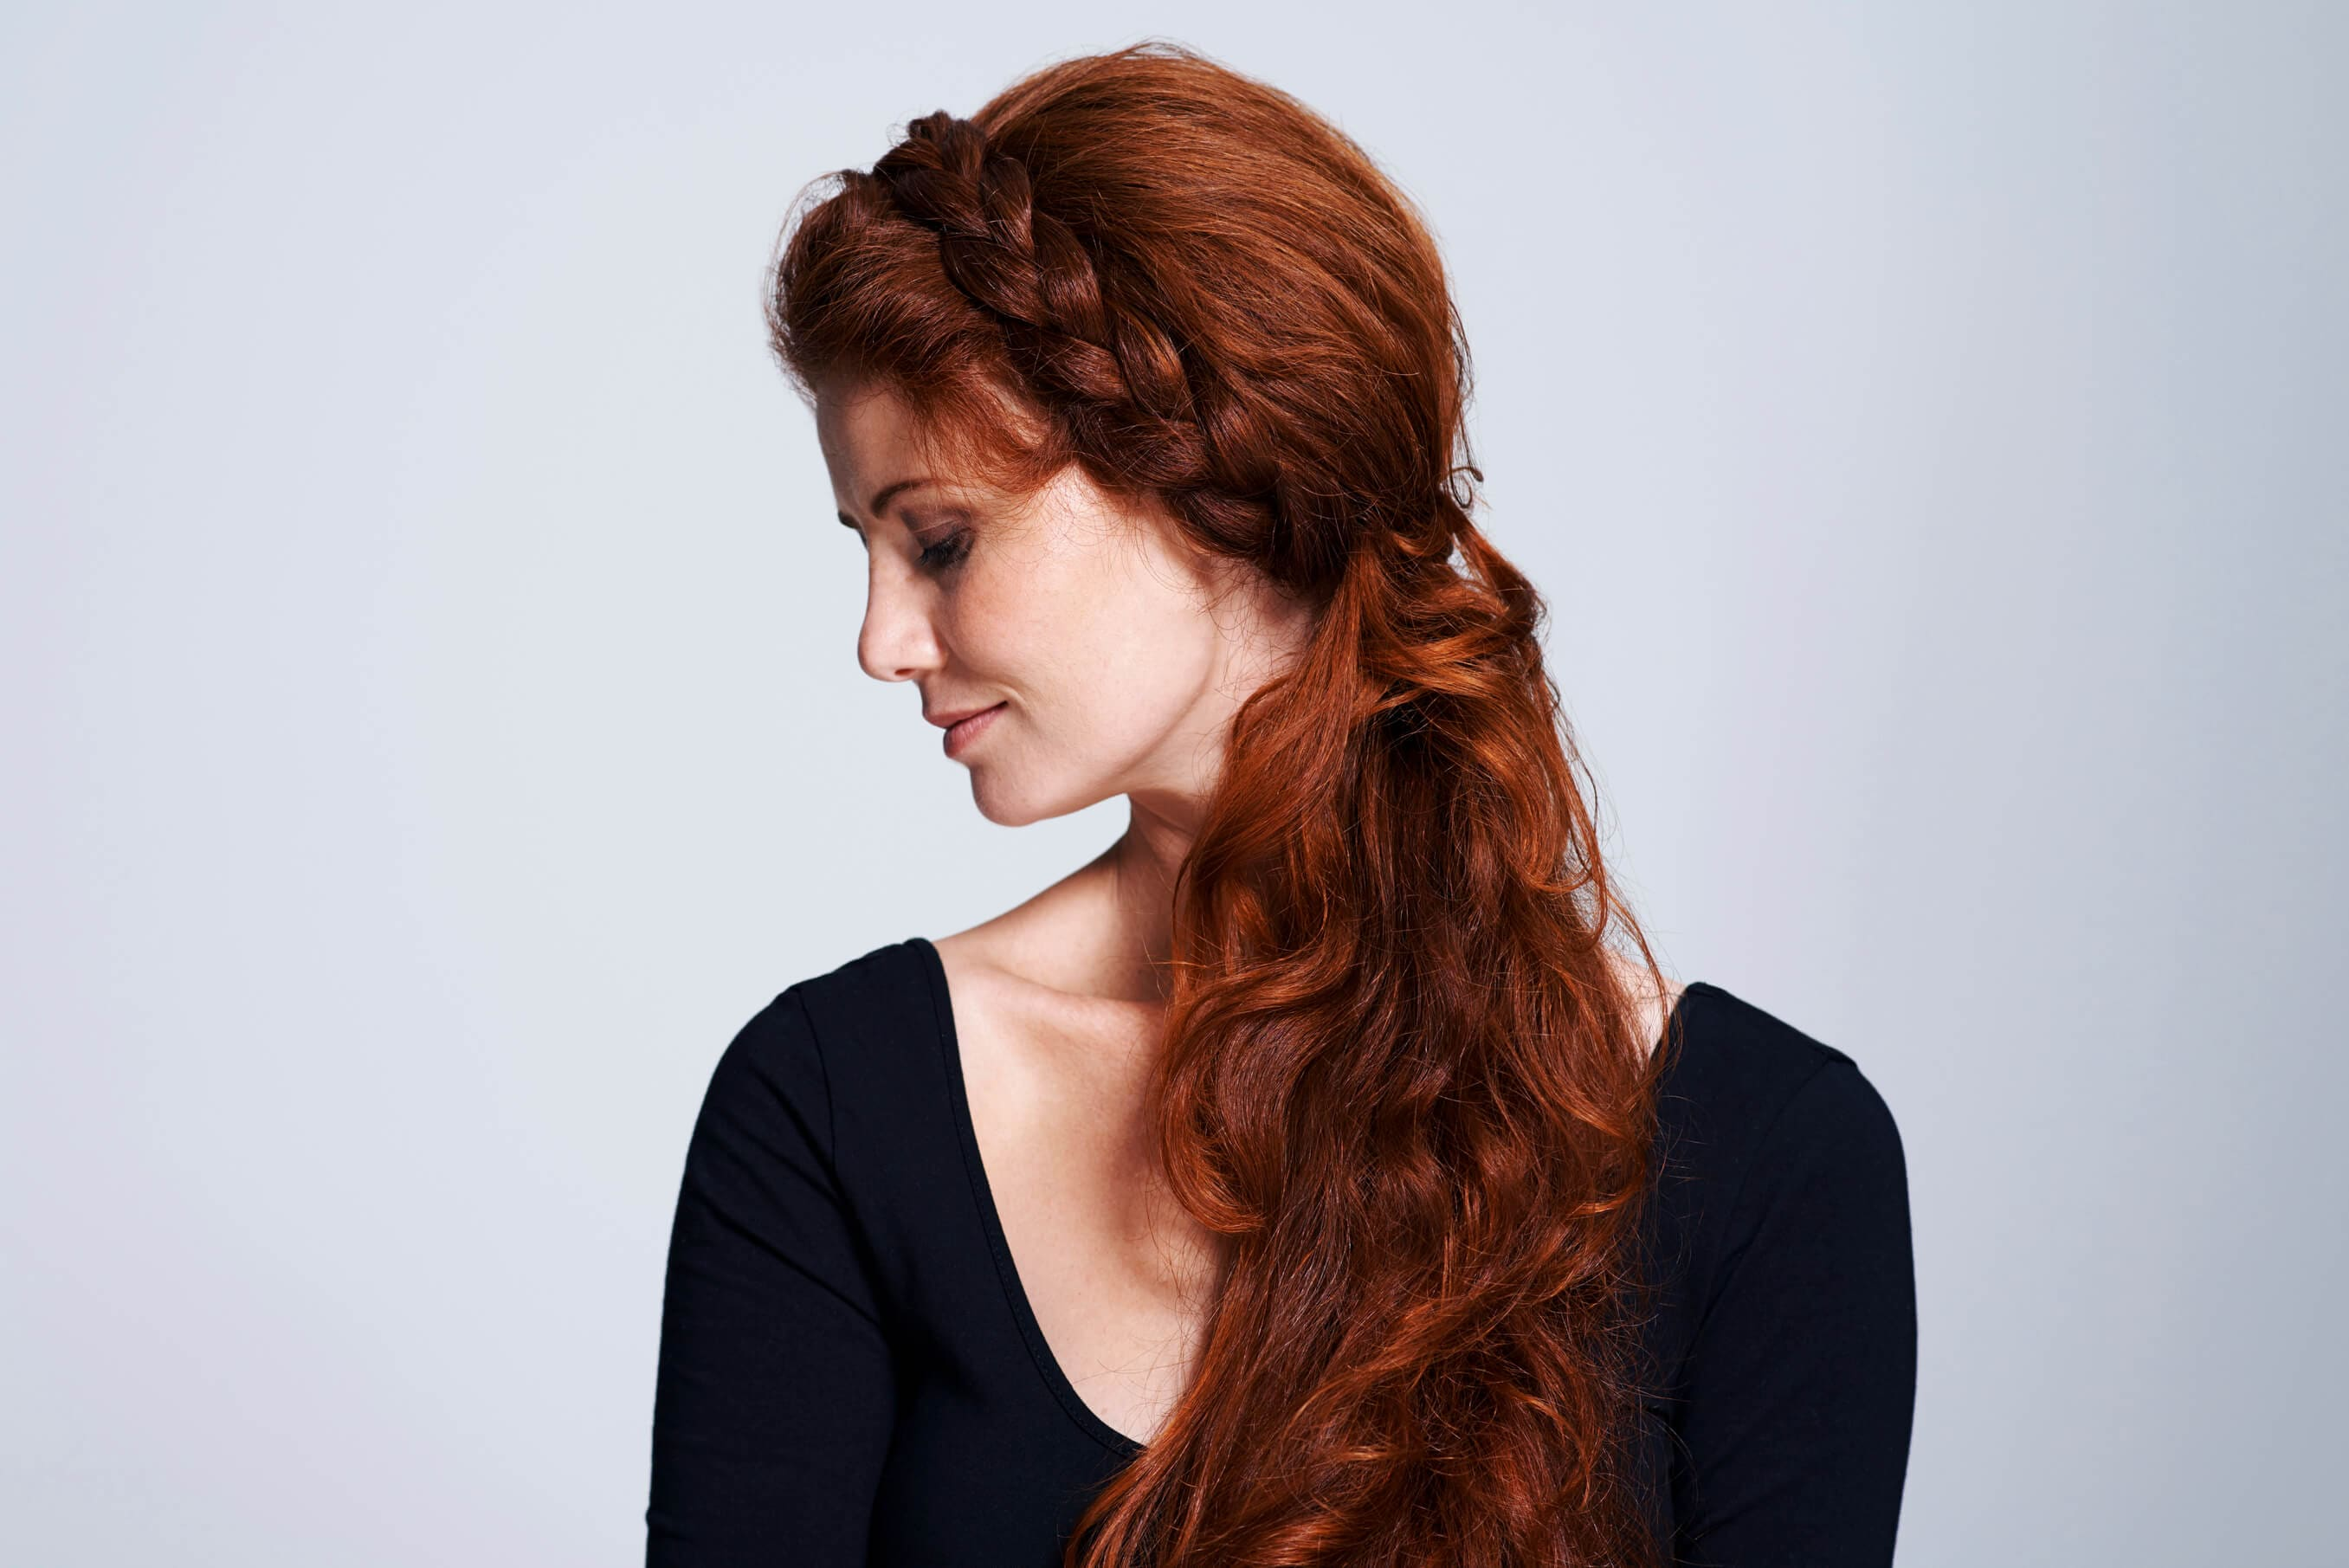 Ginger hair braids